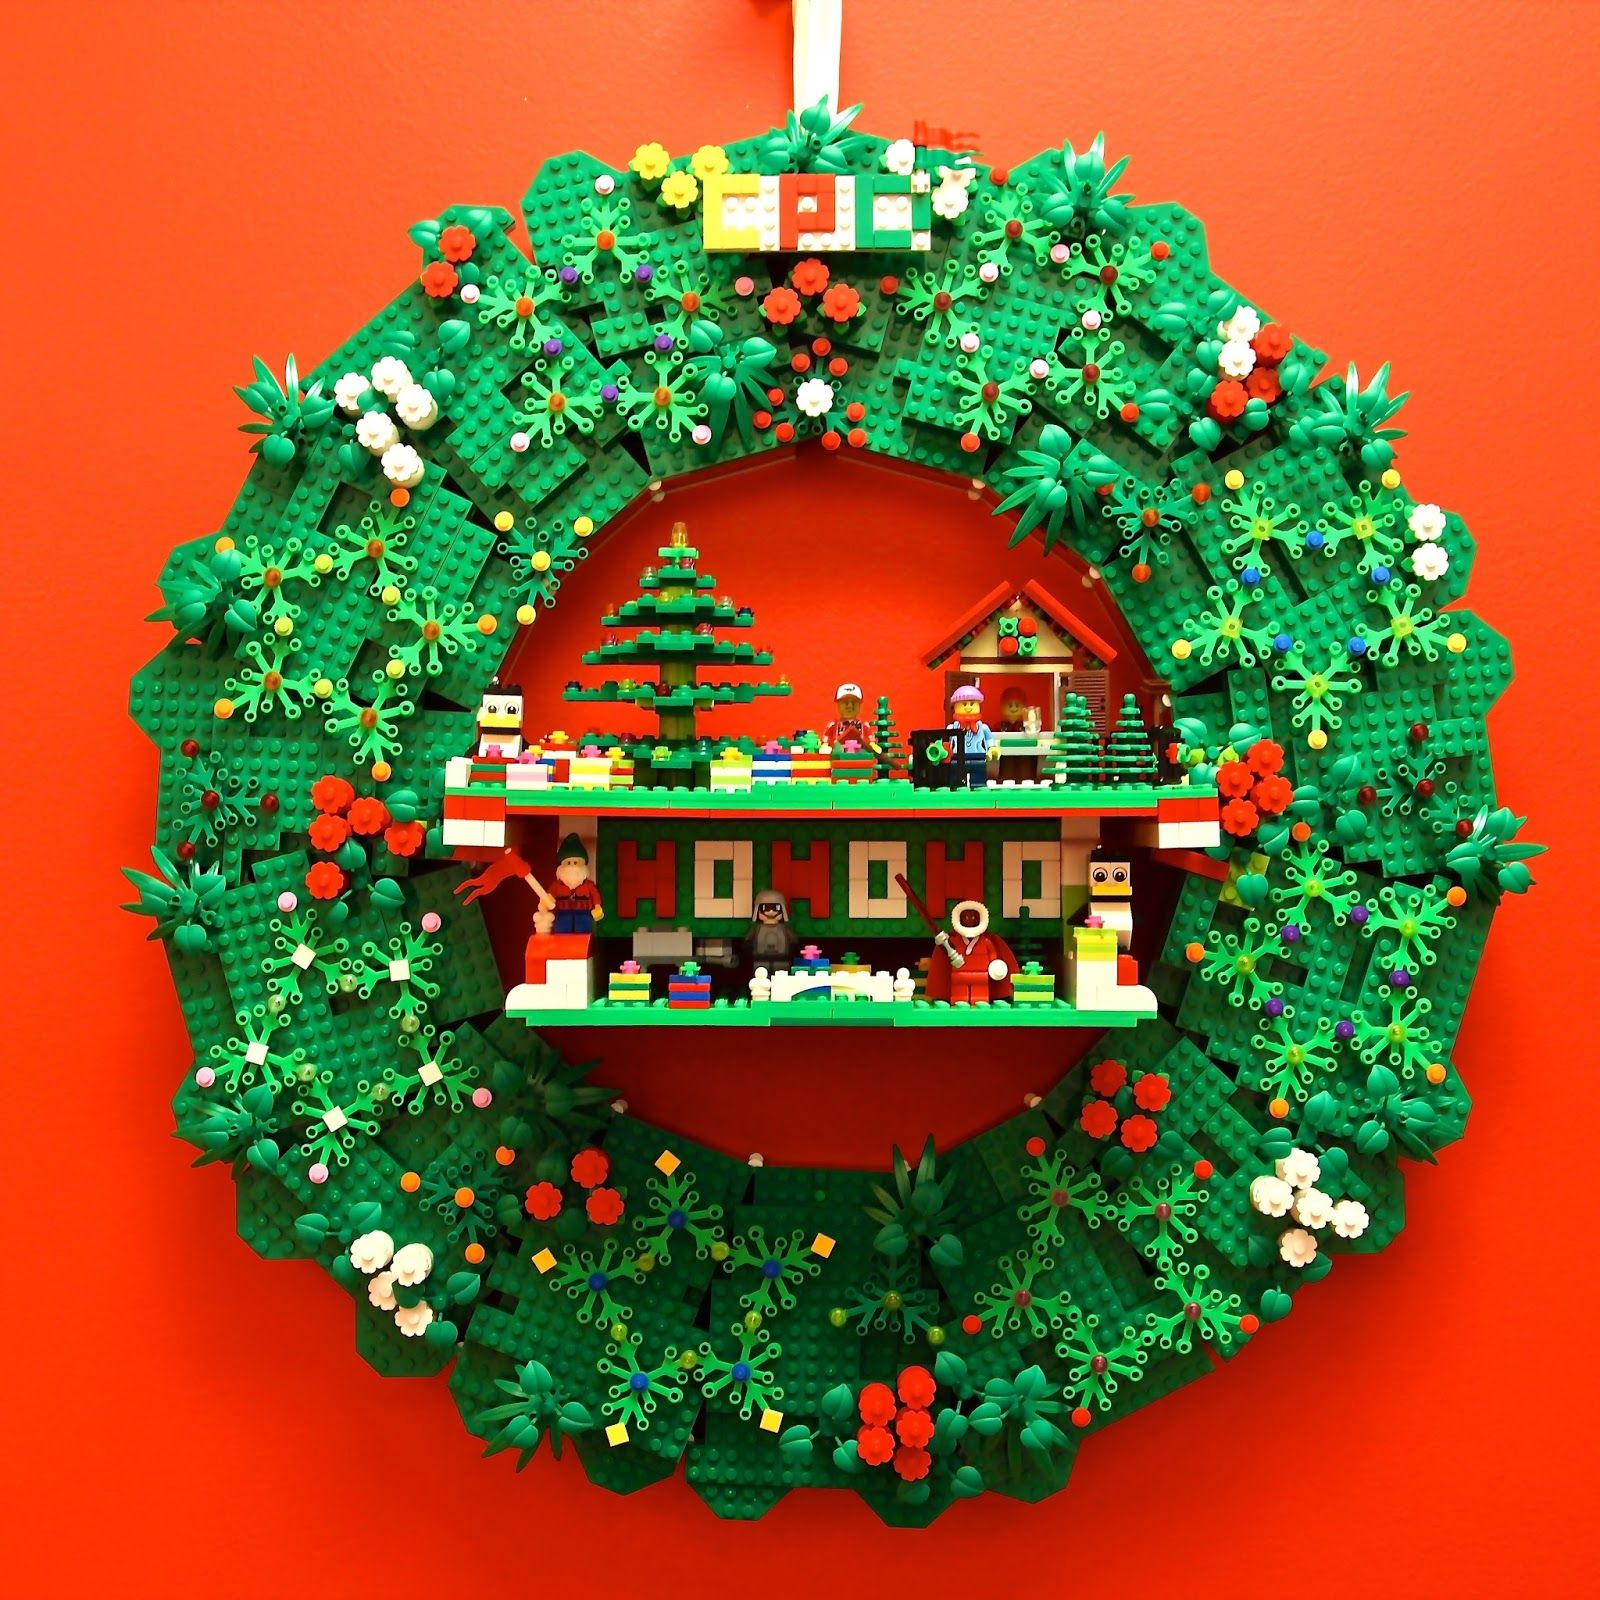 Sims 3 Seasons Christmas Tree: Four Fun LEGO Christmas Wreath Ideas